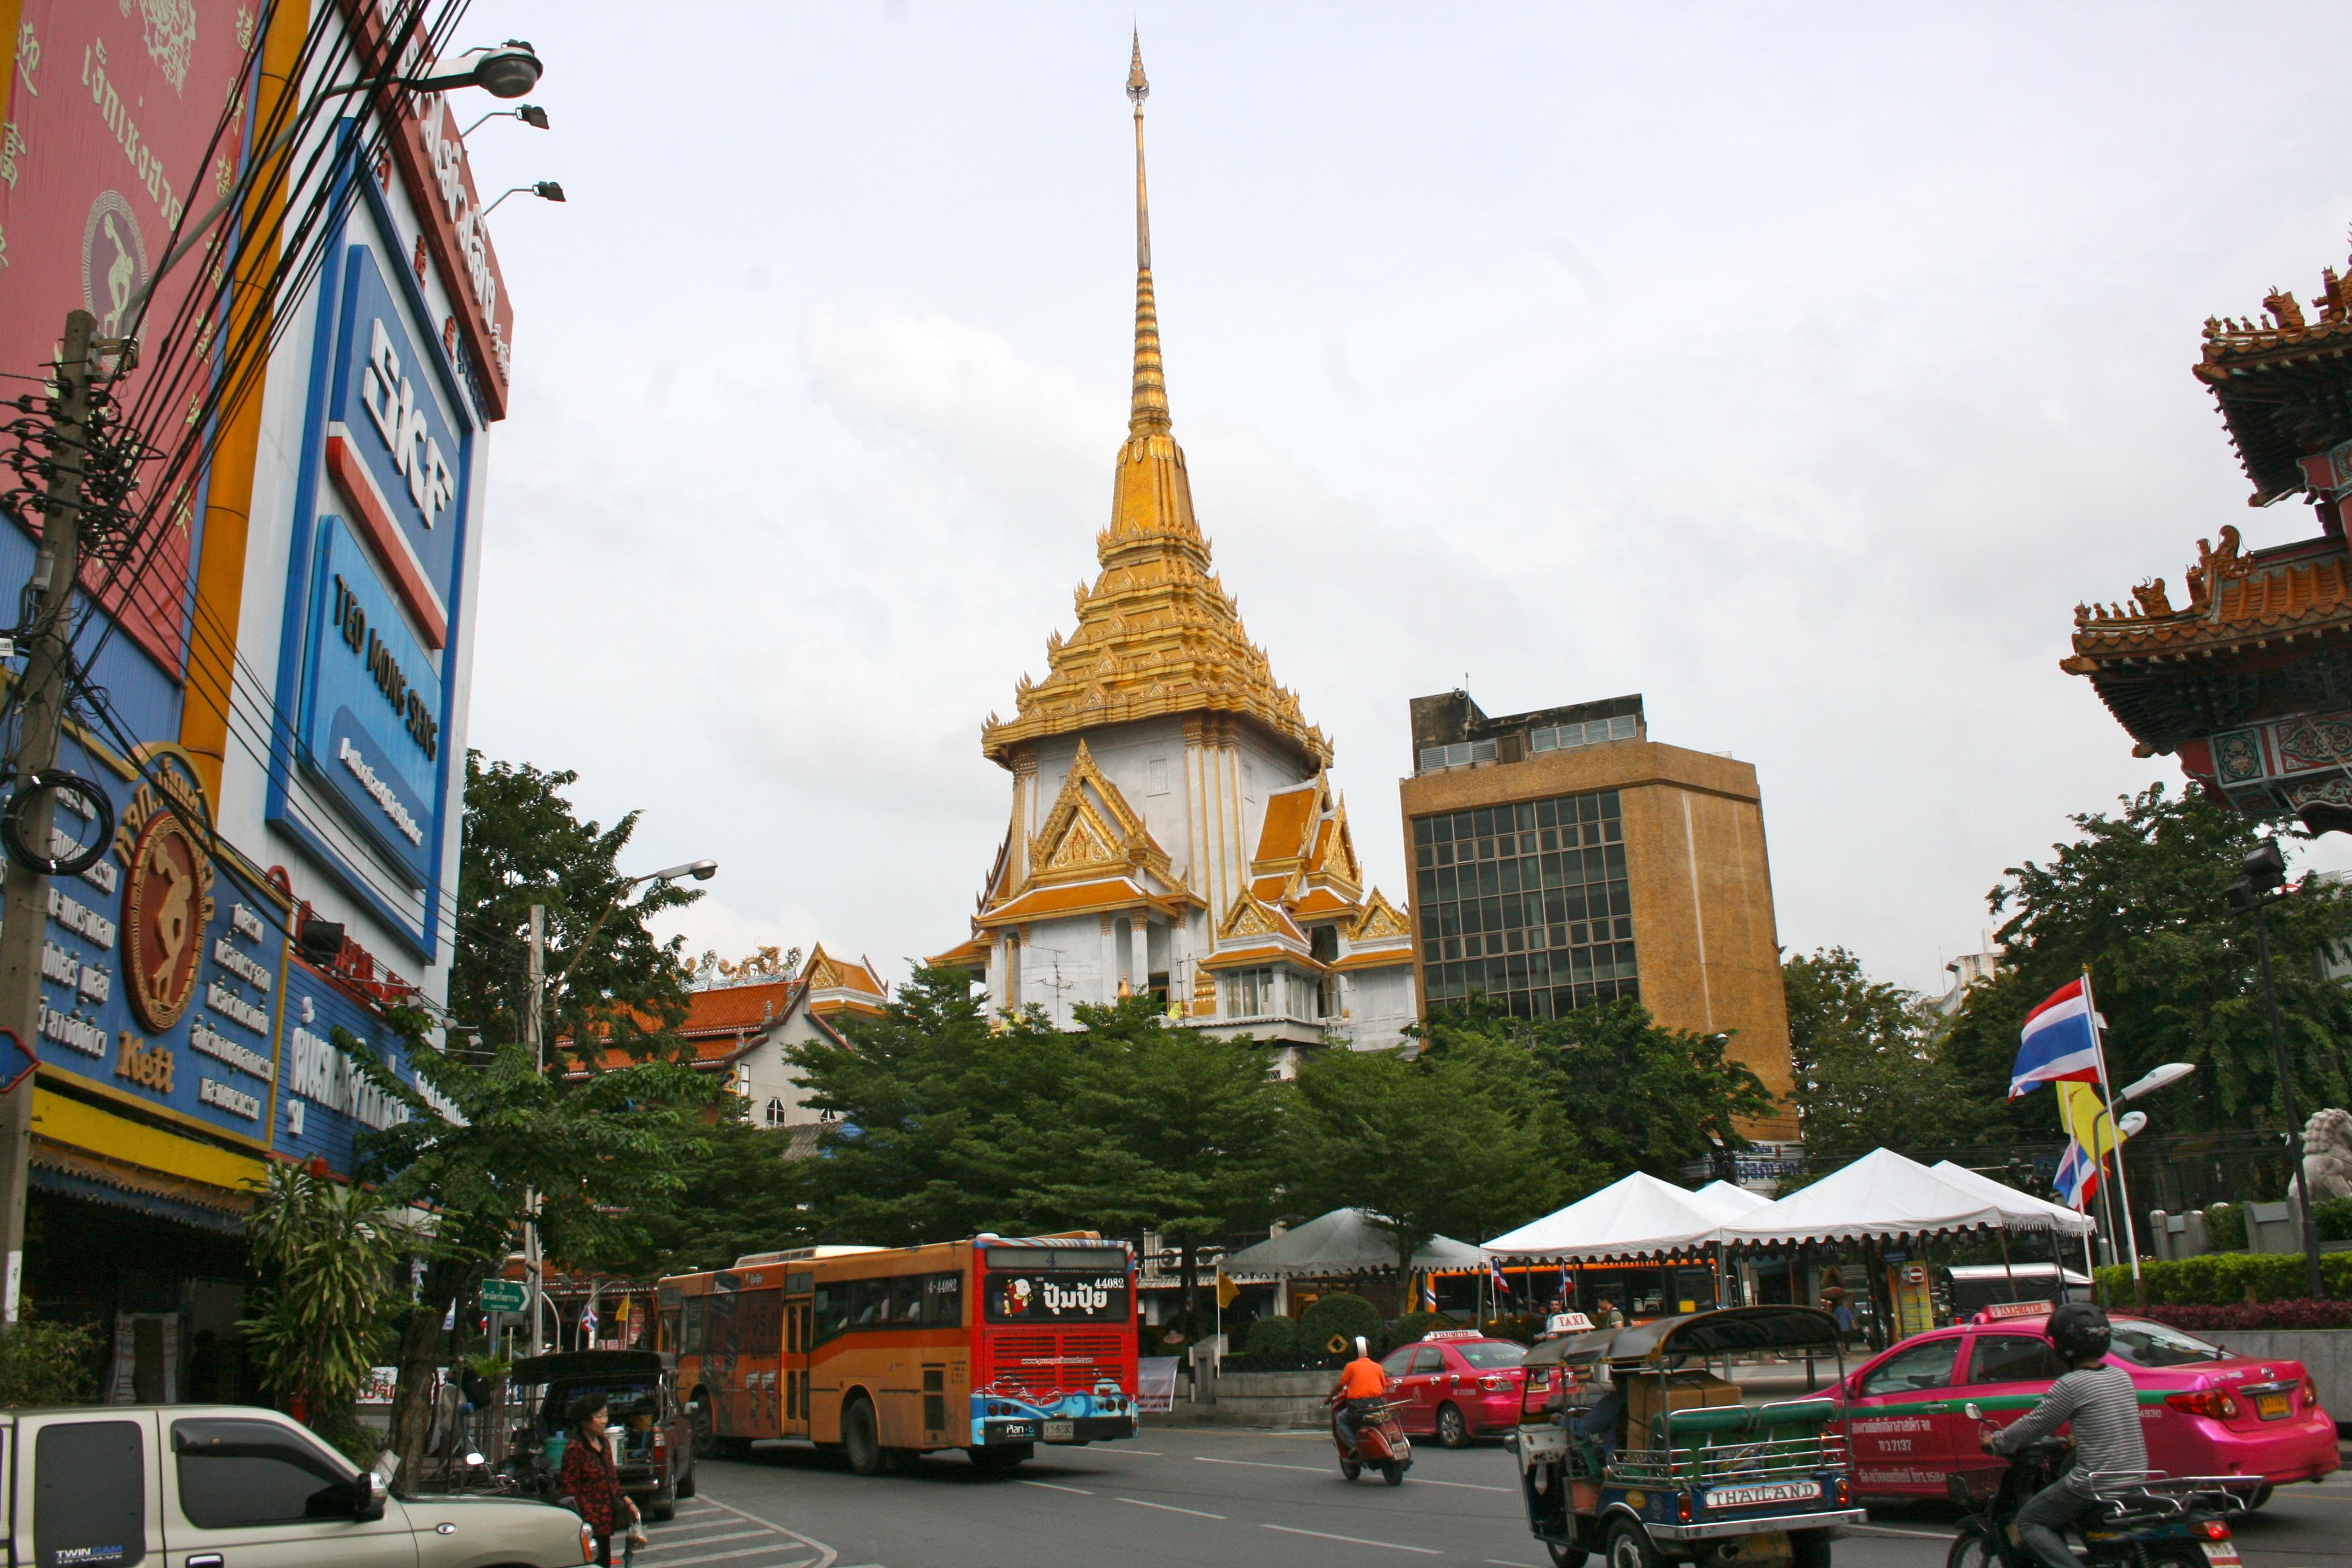 Description Wat Traimit  The Temple of the Golden Buddha  8271109826    Wat Traimit